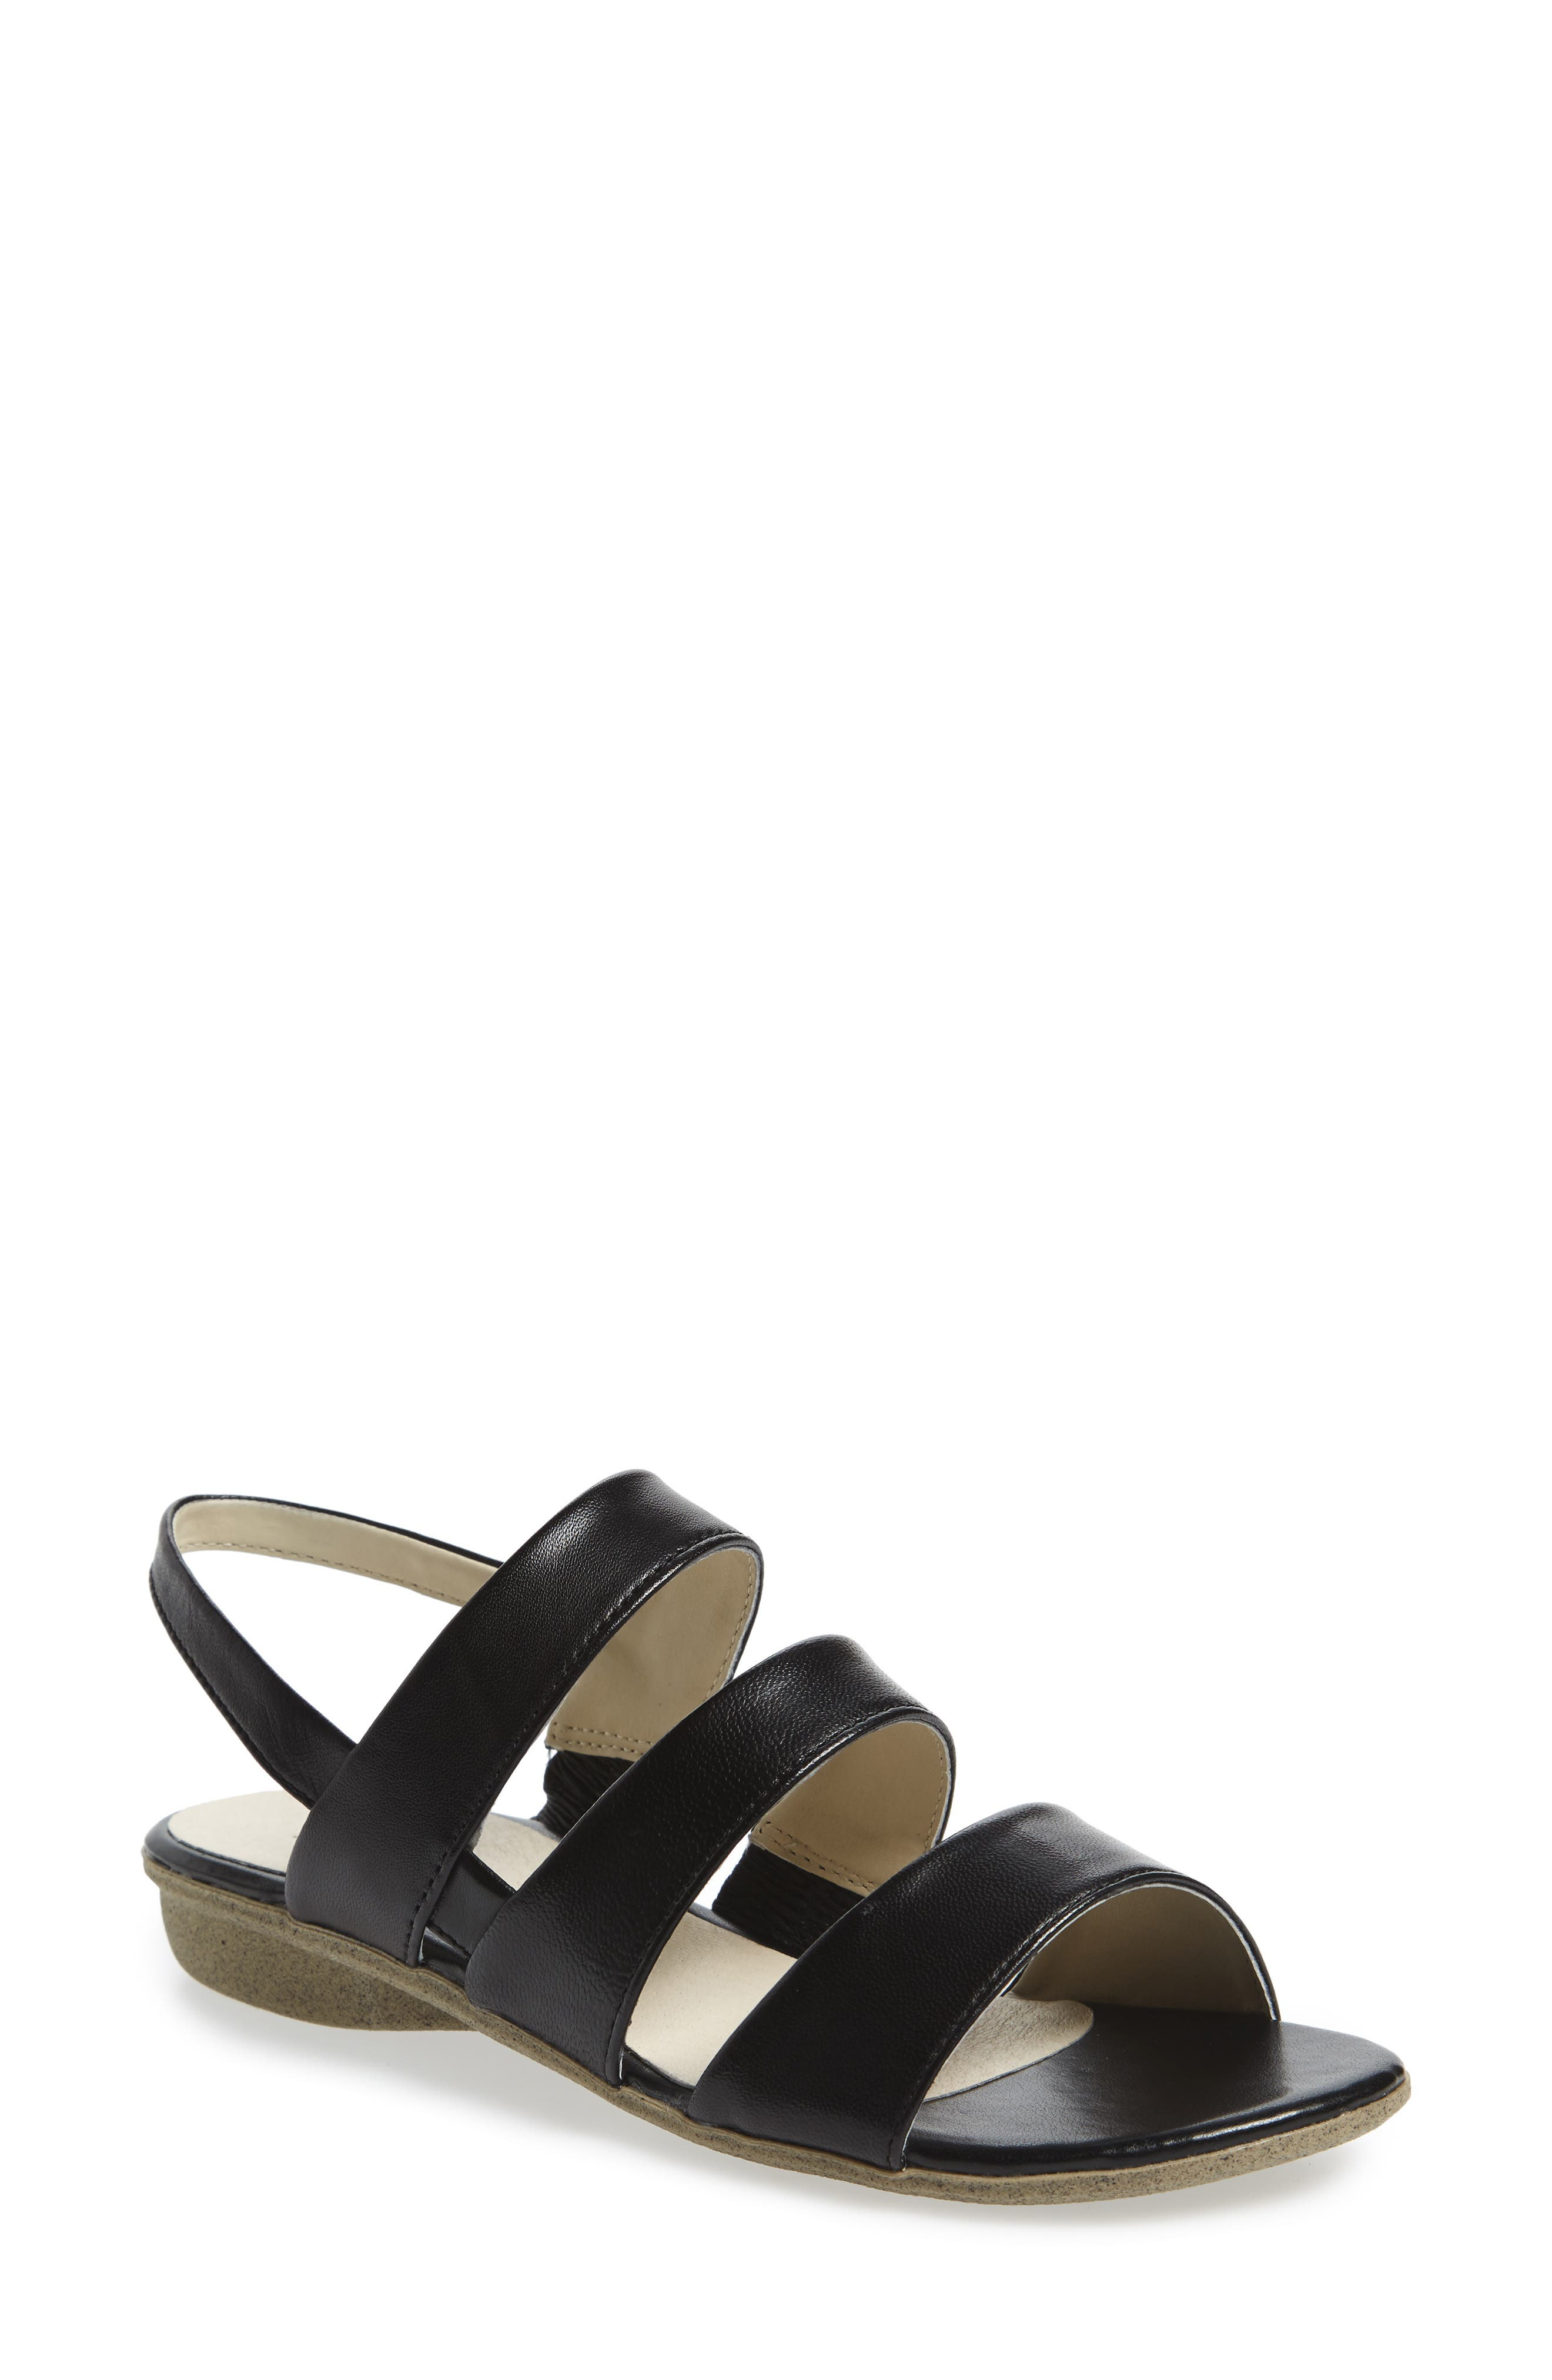 Fabia 11 Sandal,                         Main,                         color, Black